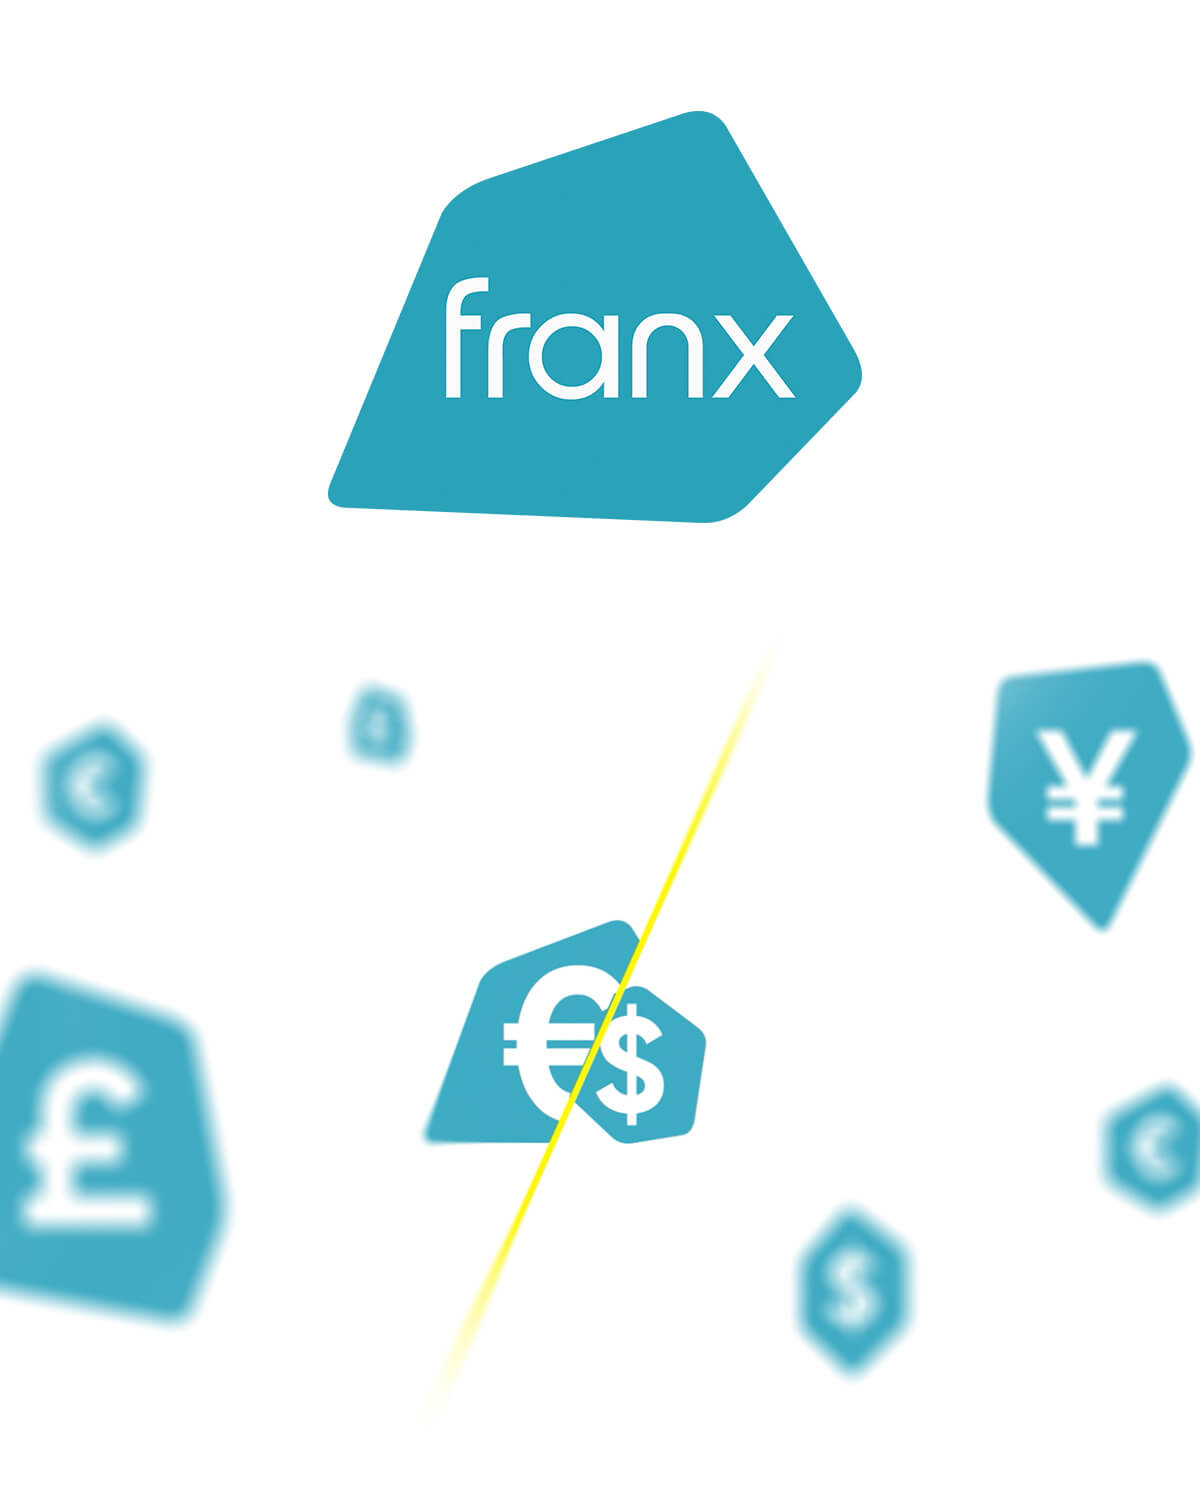 Franx